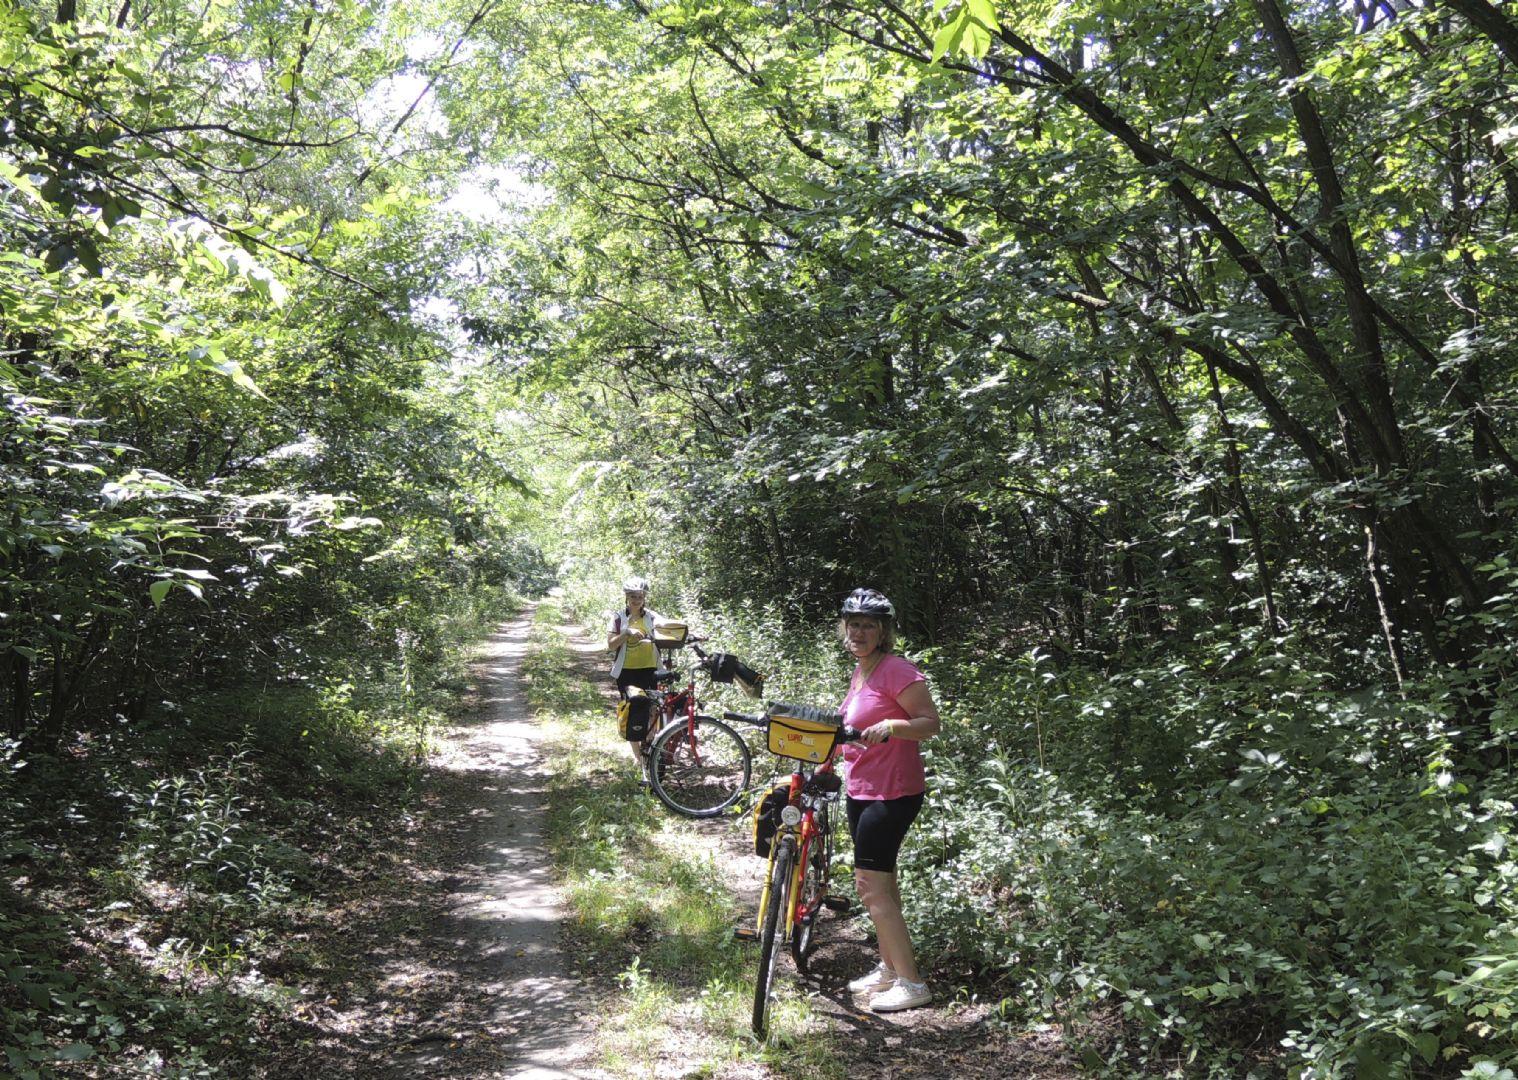 viennatobudapest9.jpg - Austria, Slovakia and Hungary - Vienna to Budapest - Self-Guided Family Cycling Holiday - Family Cycling